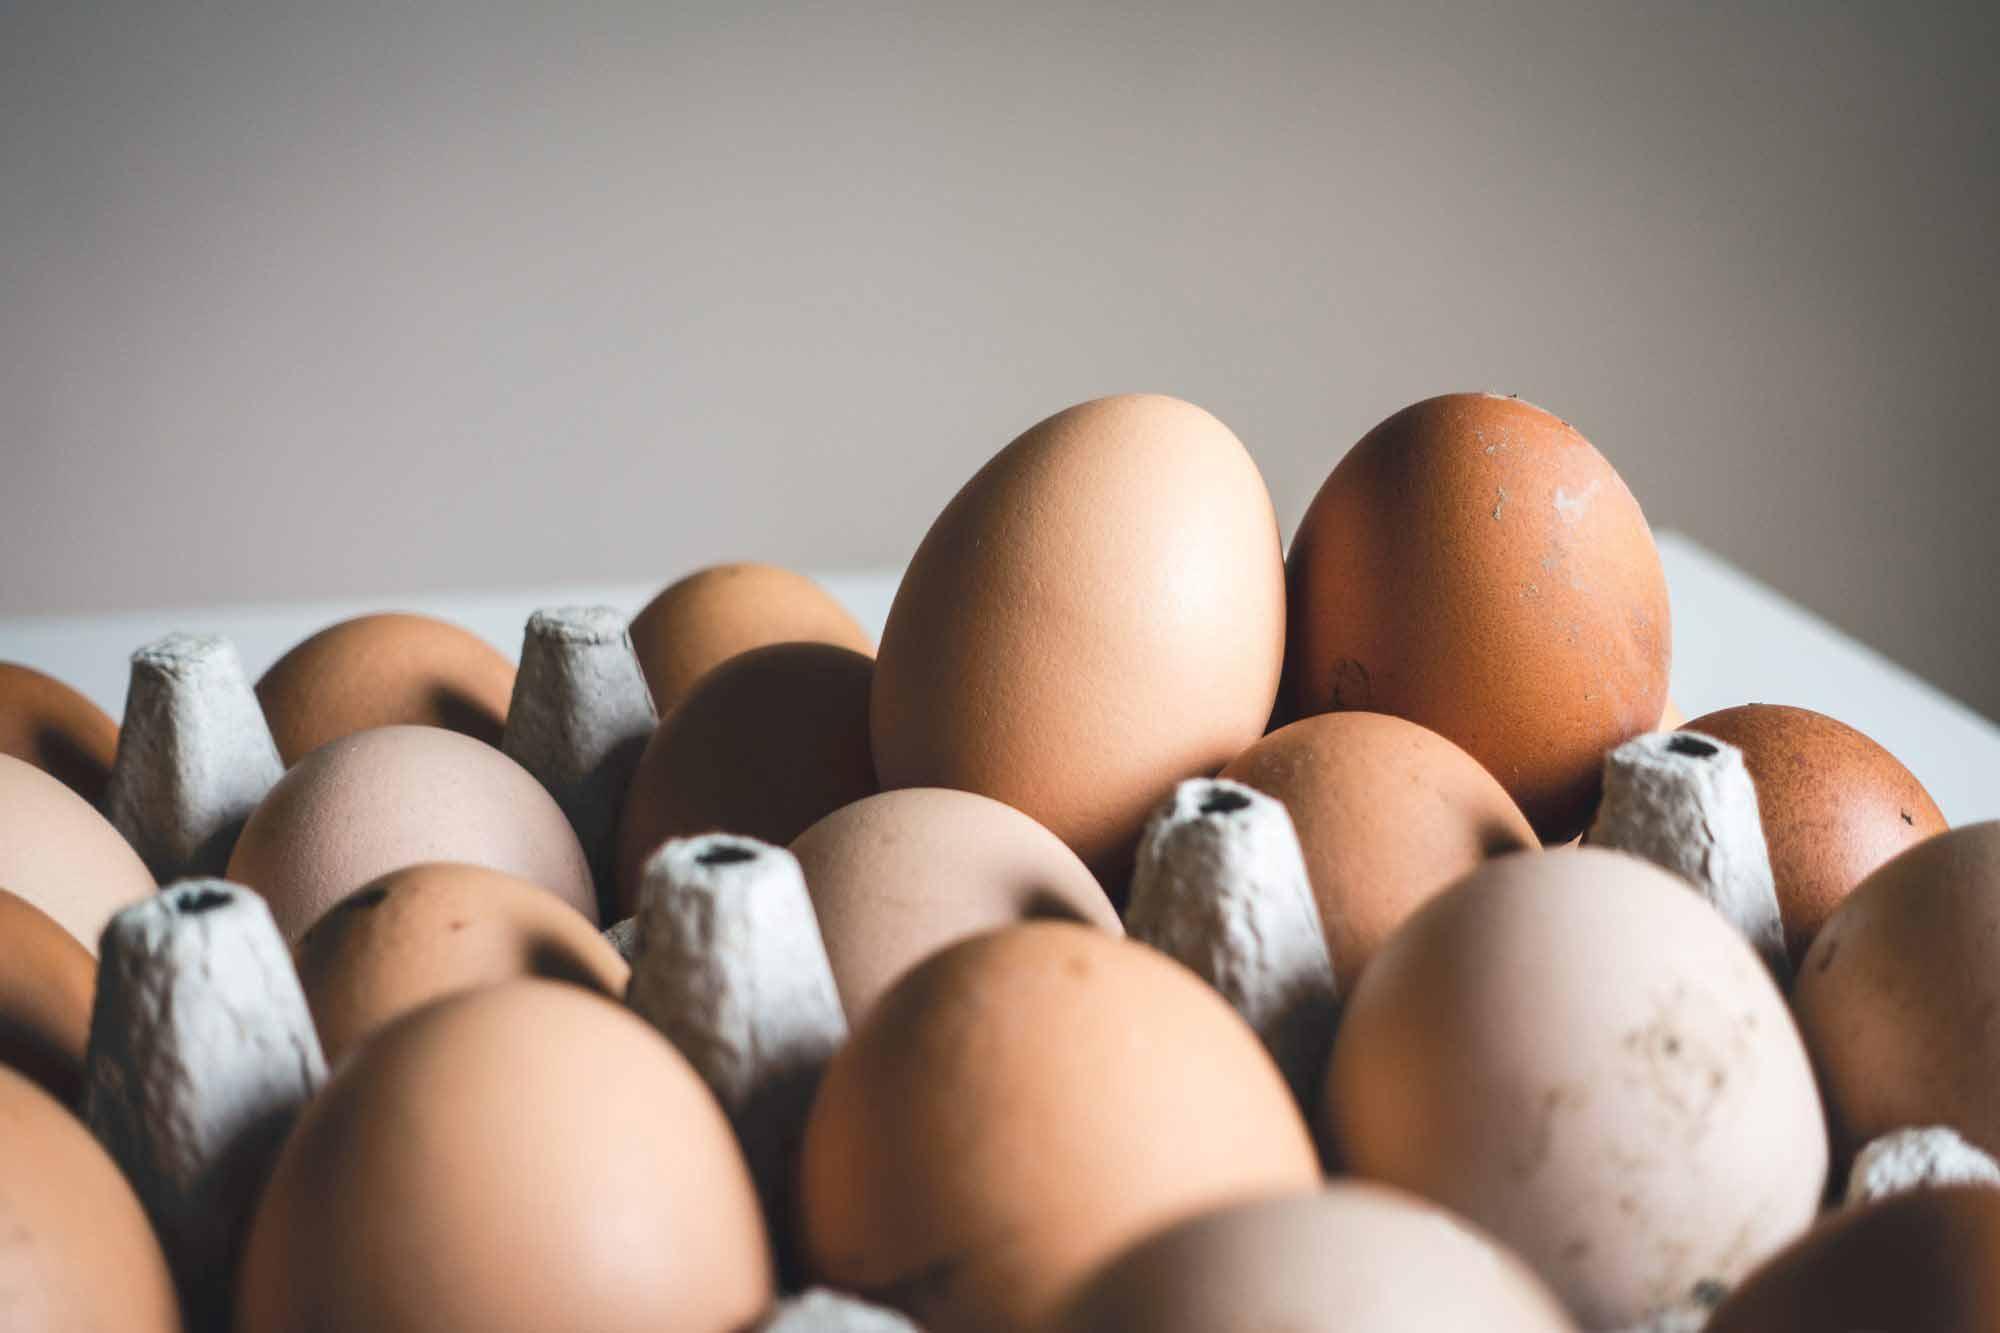 Dutch poison egg alert hits the UK